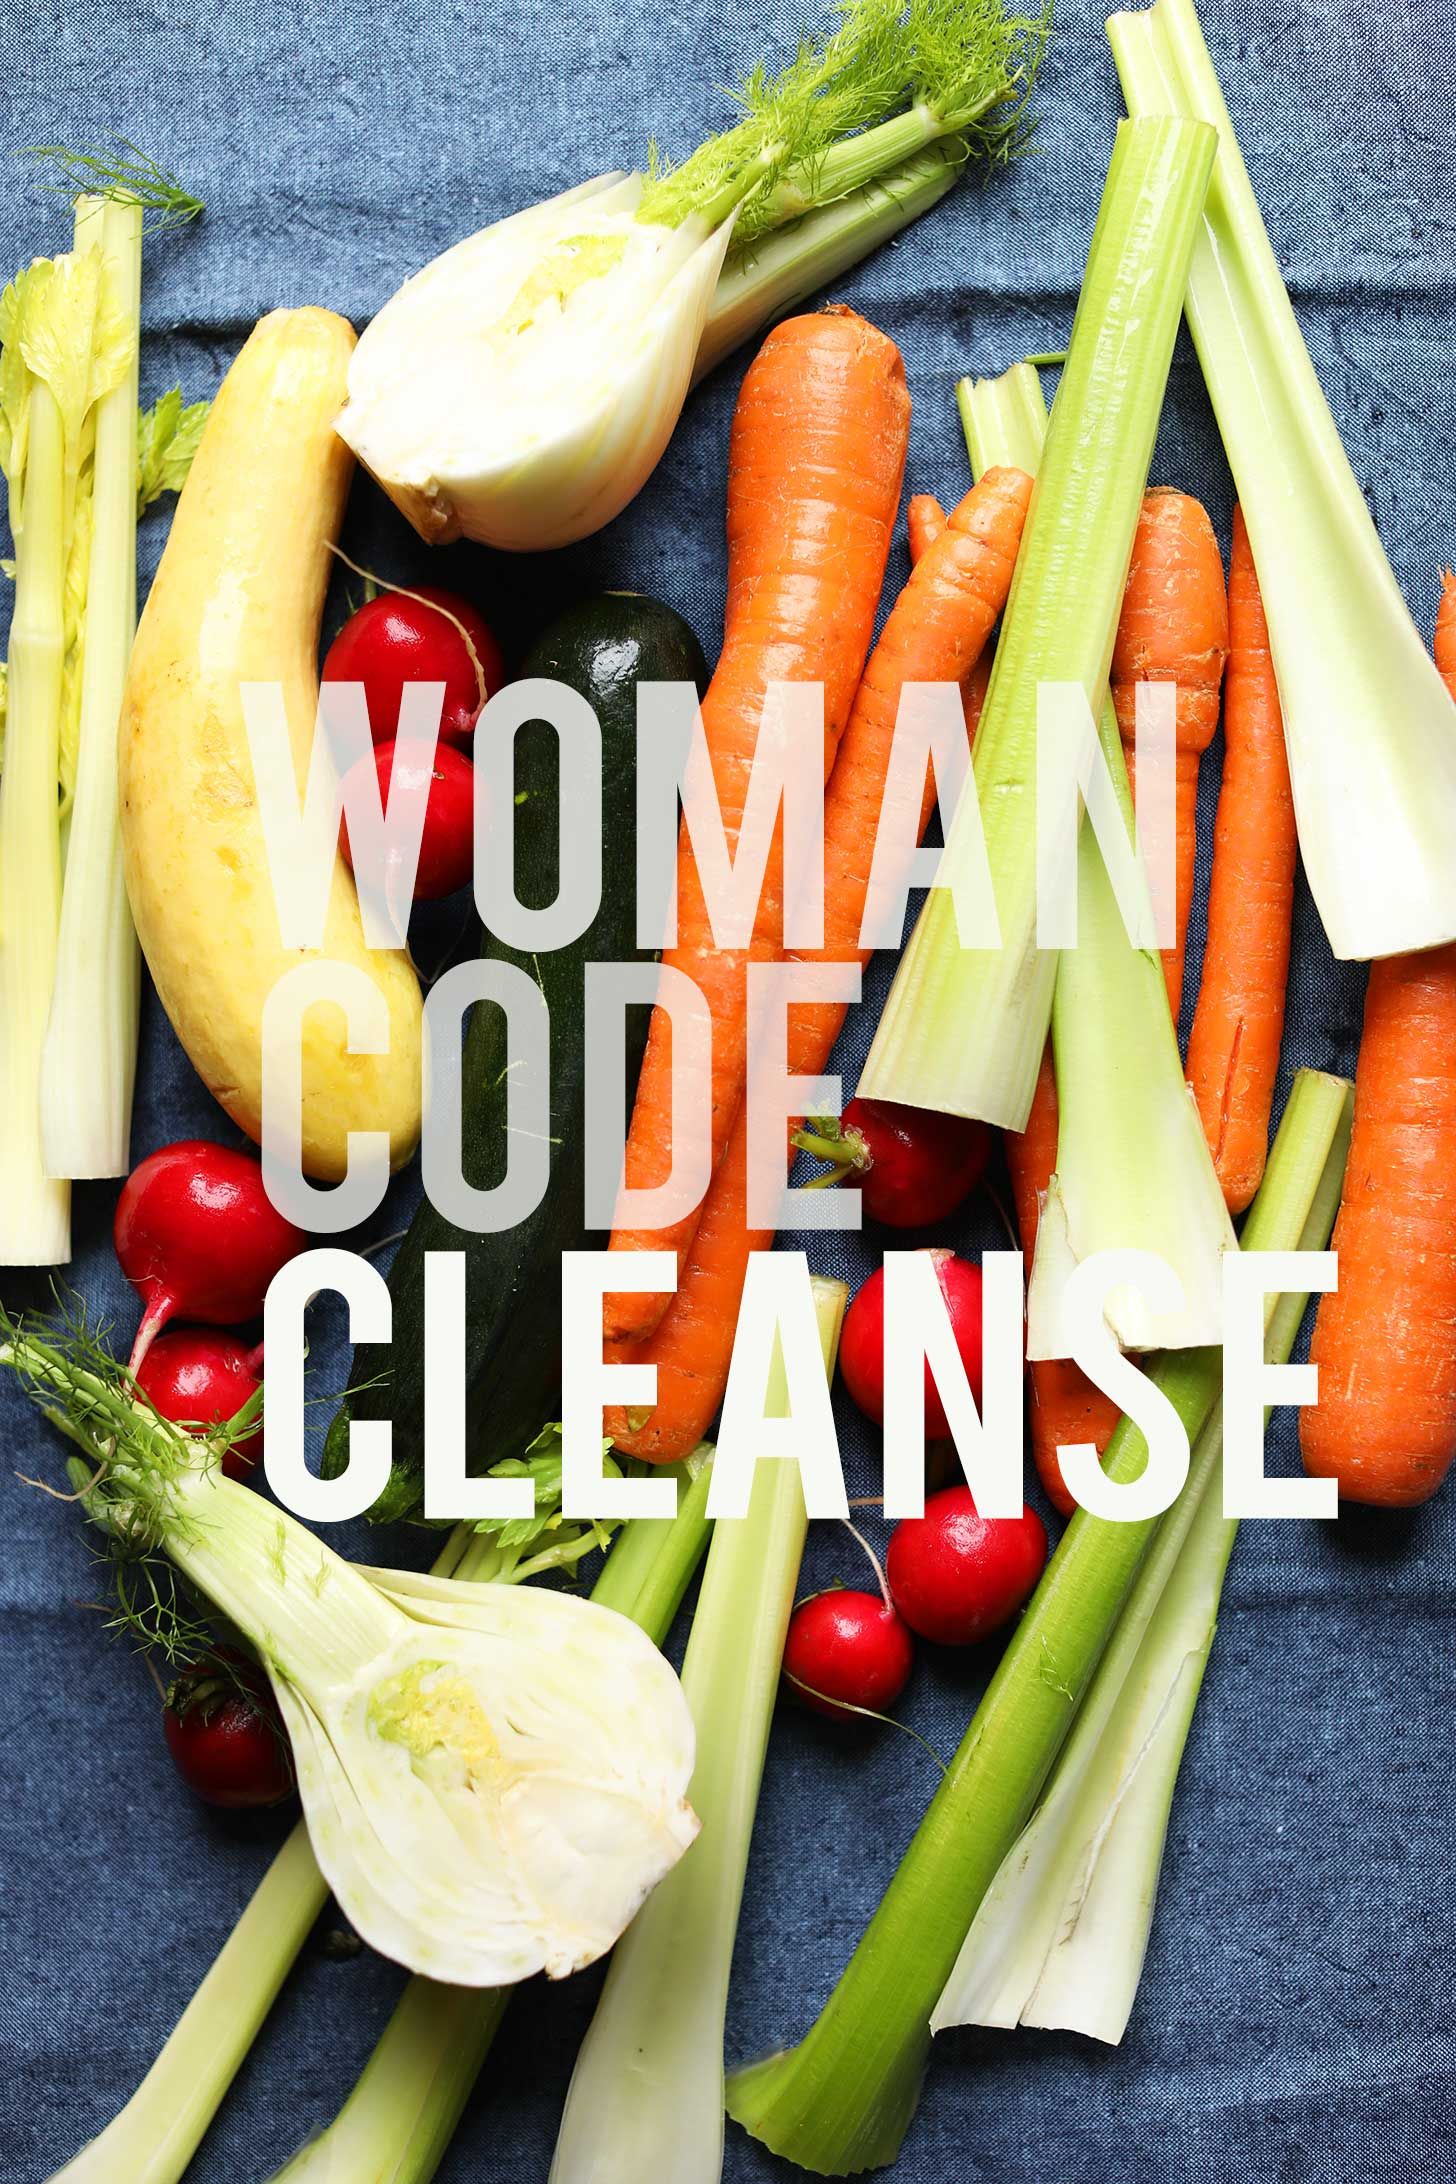 Woman Code Cleanse written over an assortment of fresh vegetables